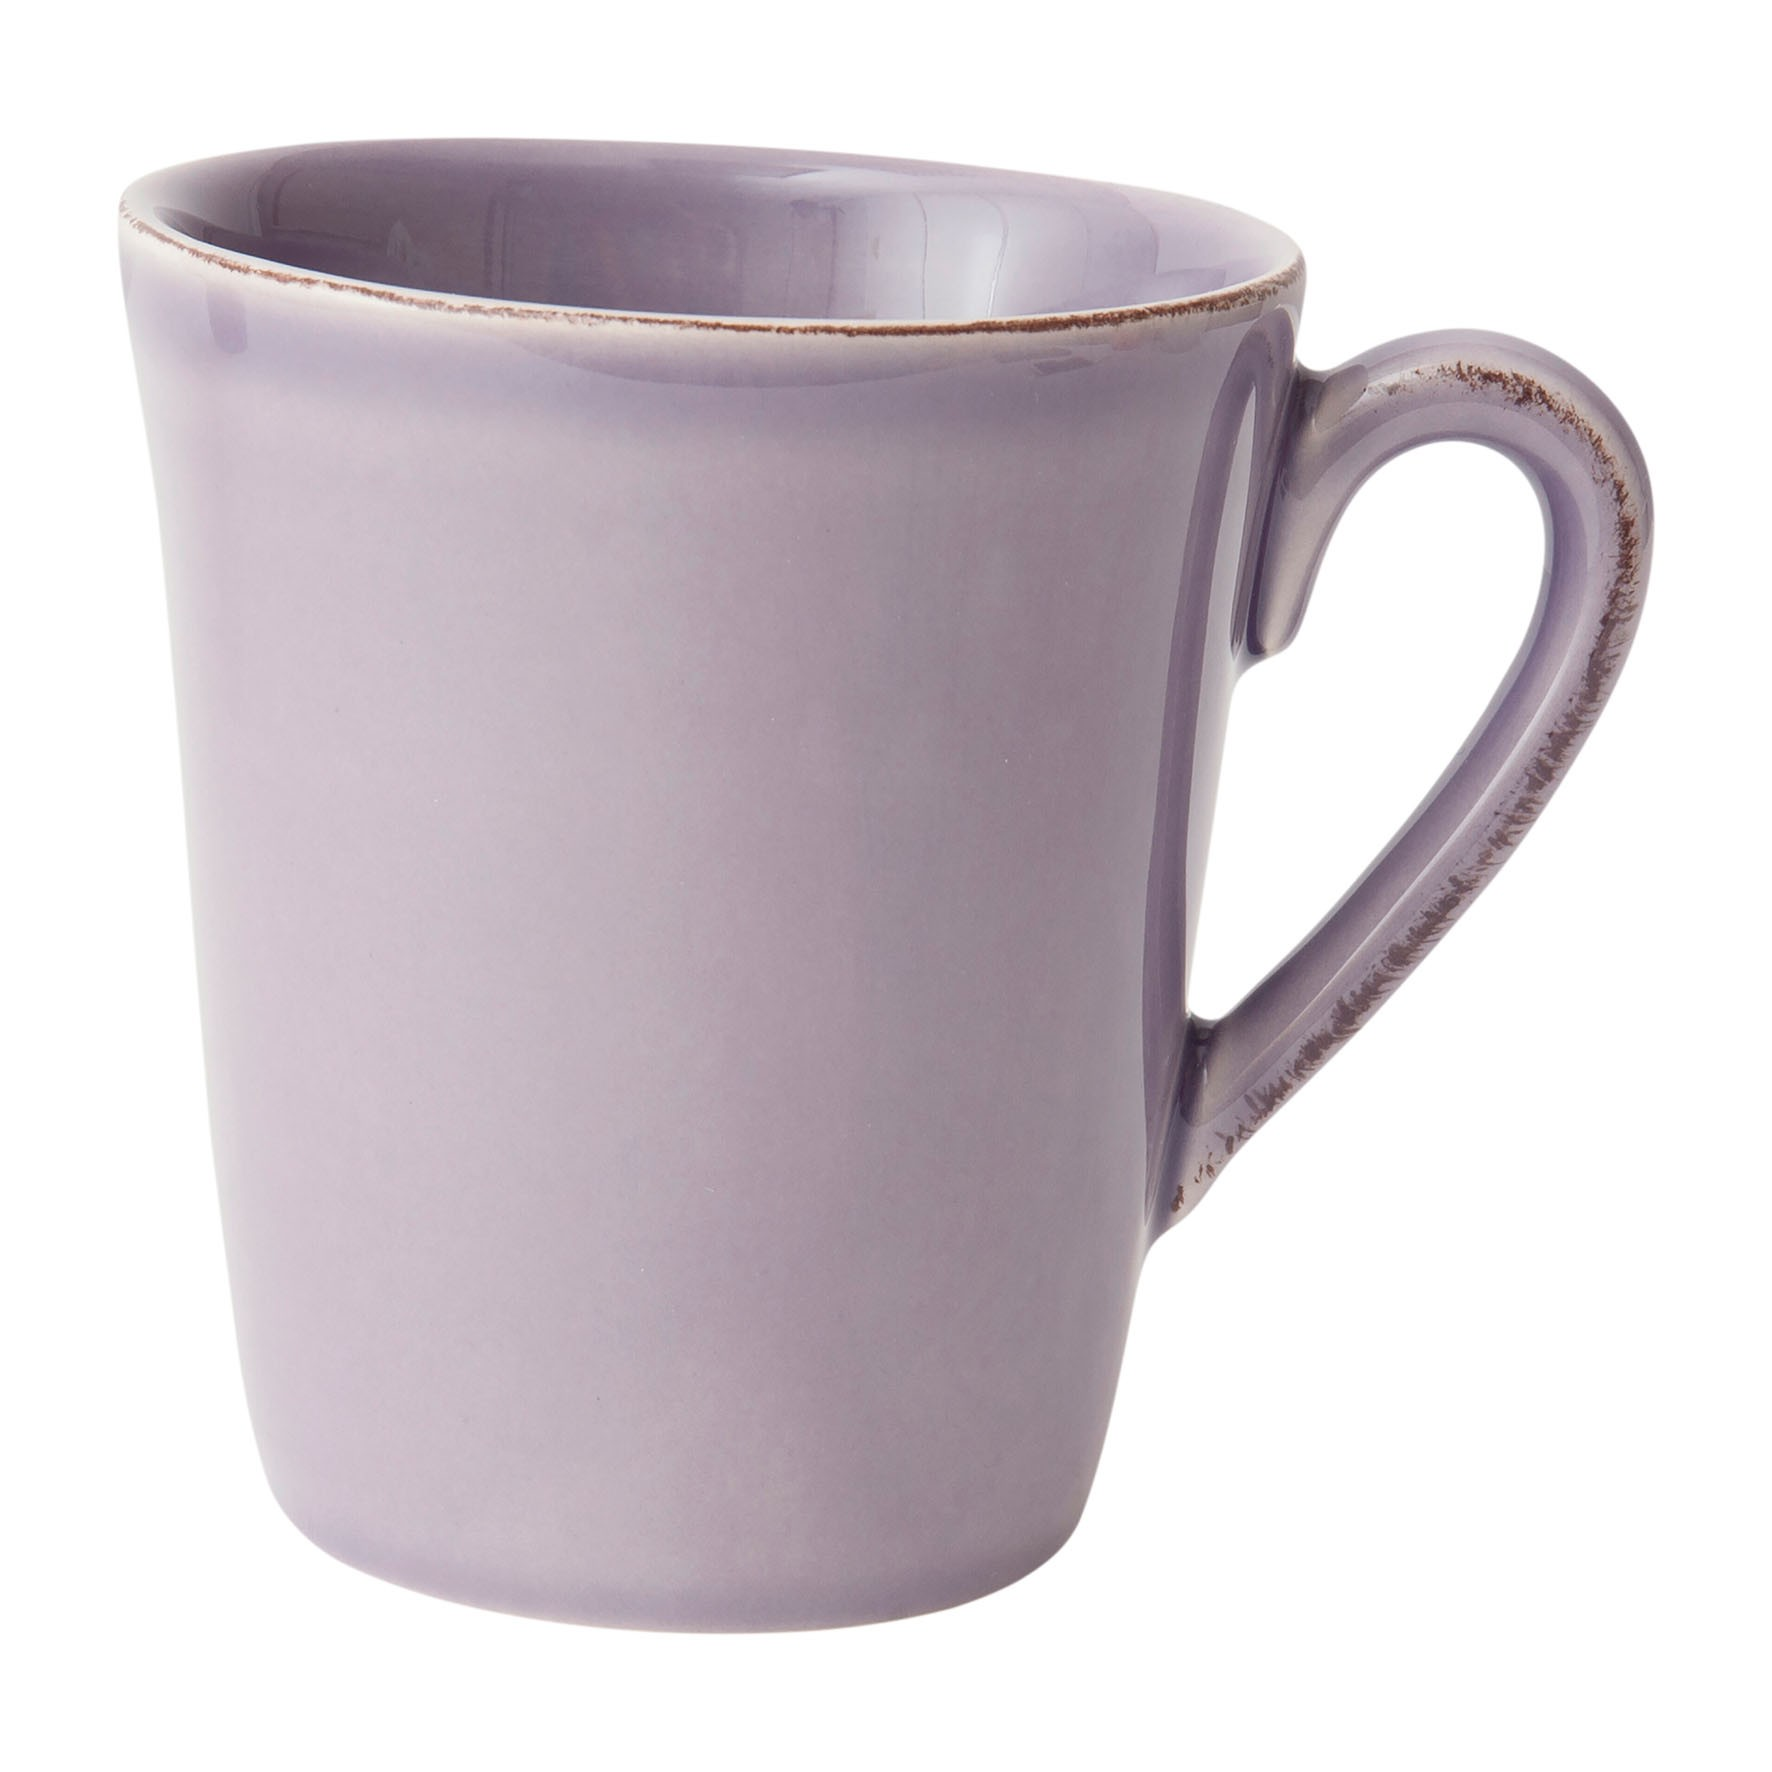 Constance - mug chardon 25cl  (par2)